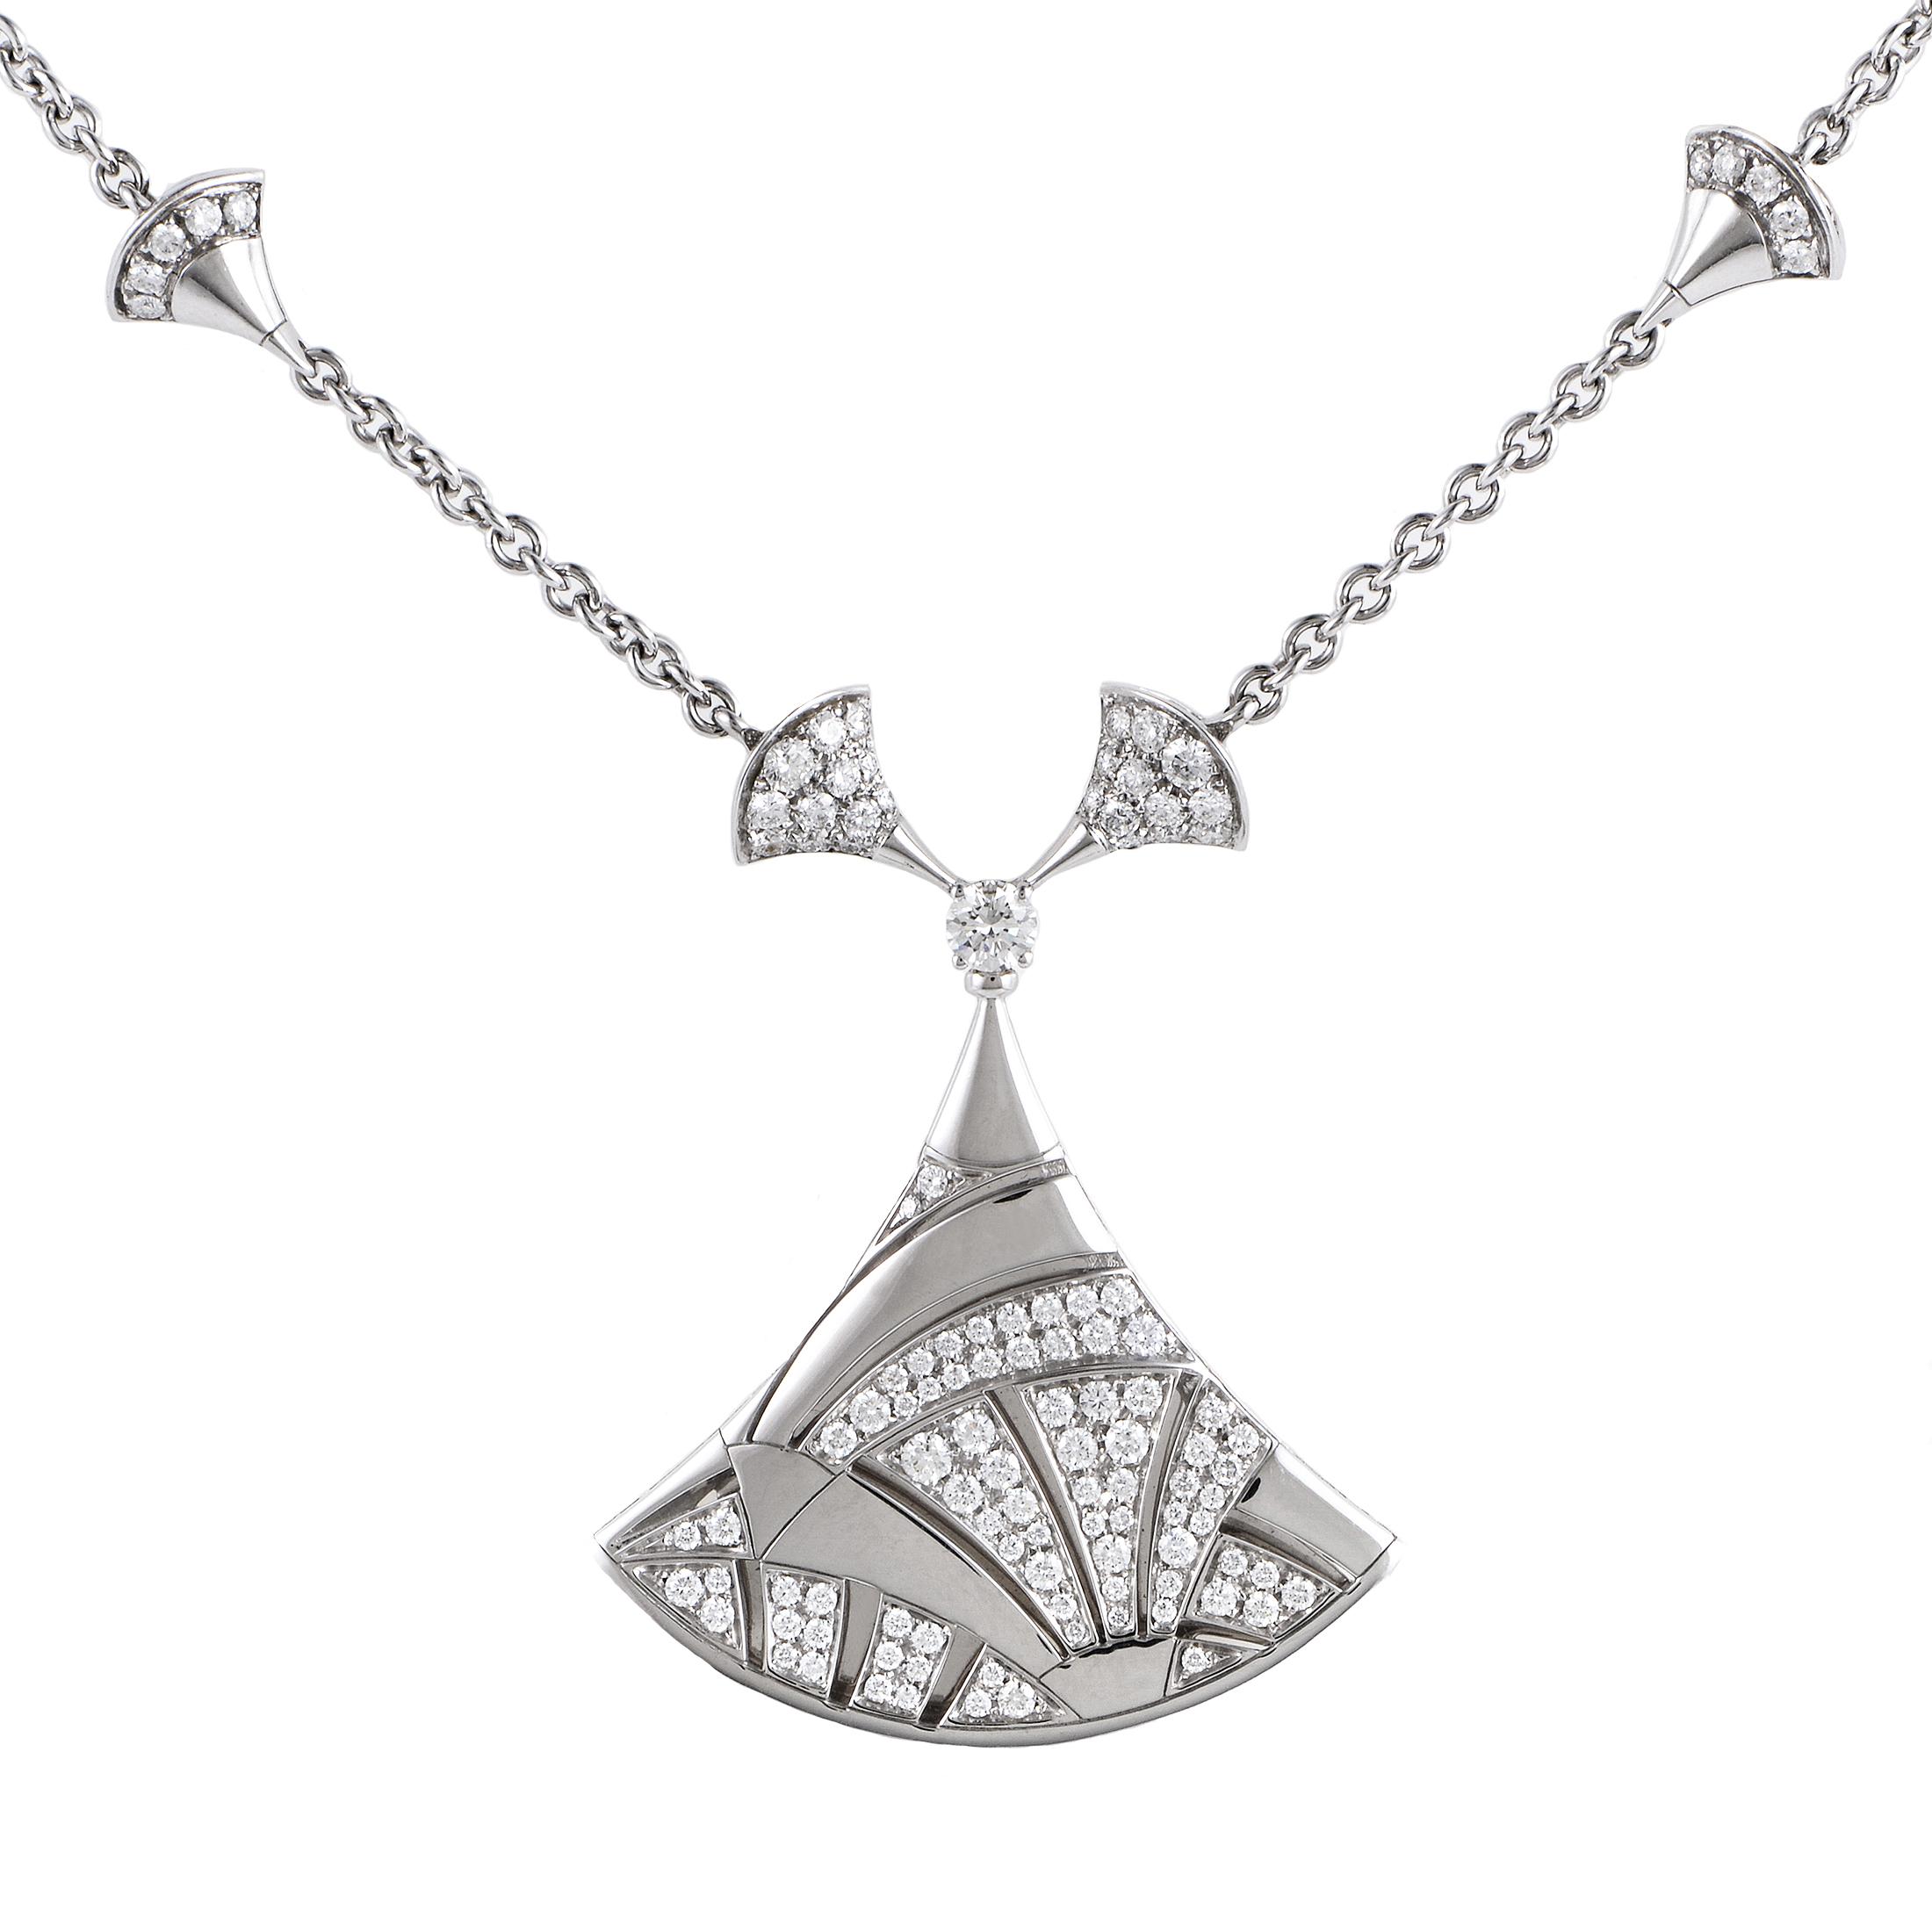 Bvlgari Diva's Dream 18K White Gold Diamond Pendant Necklace